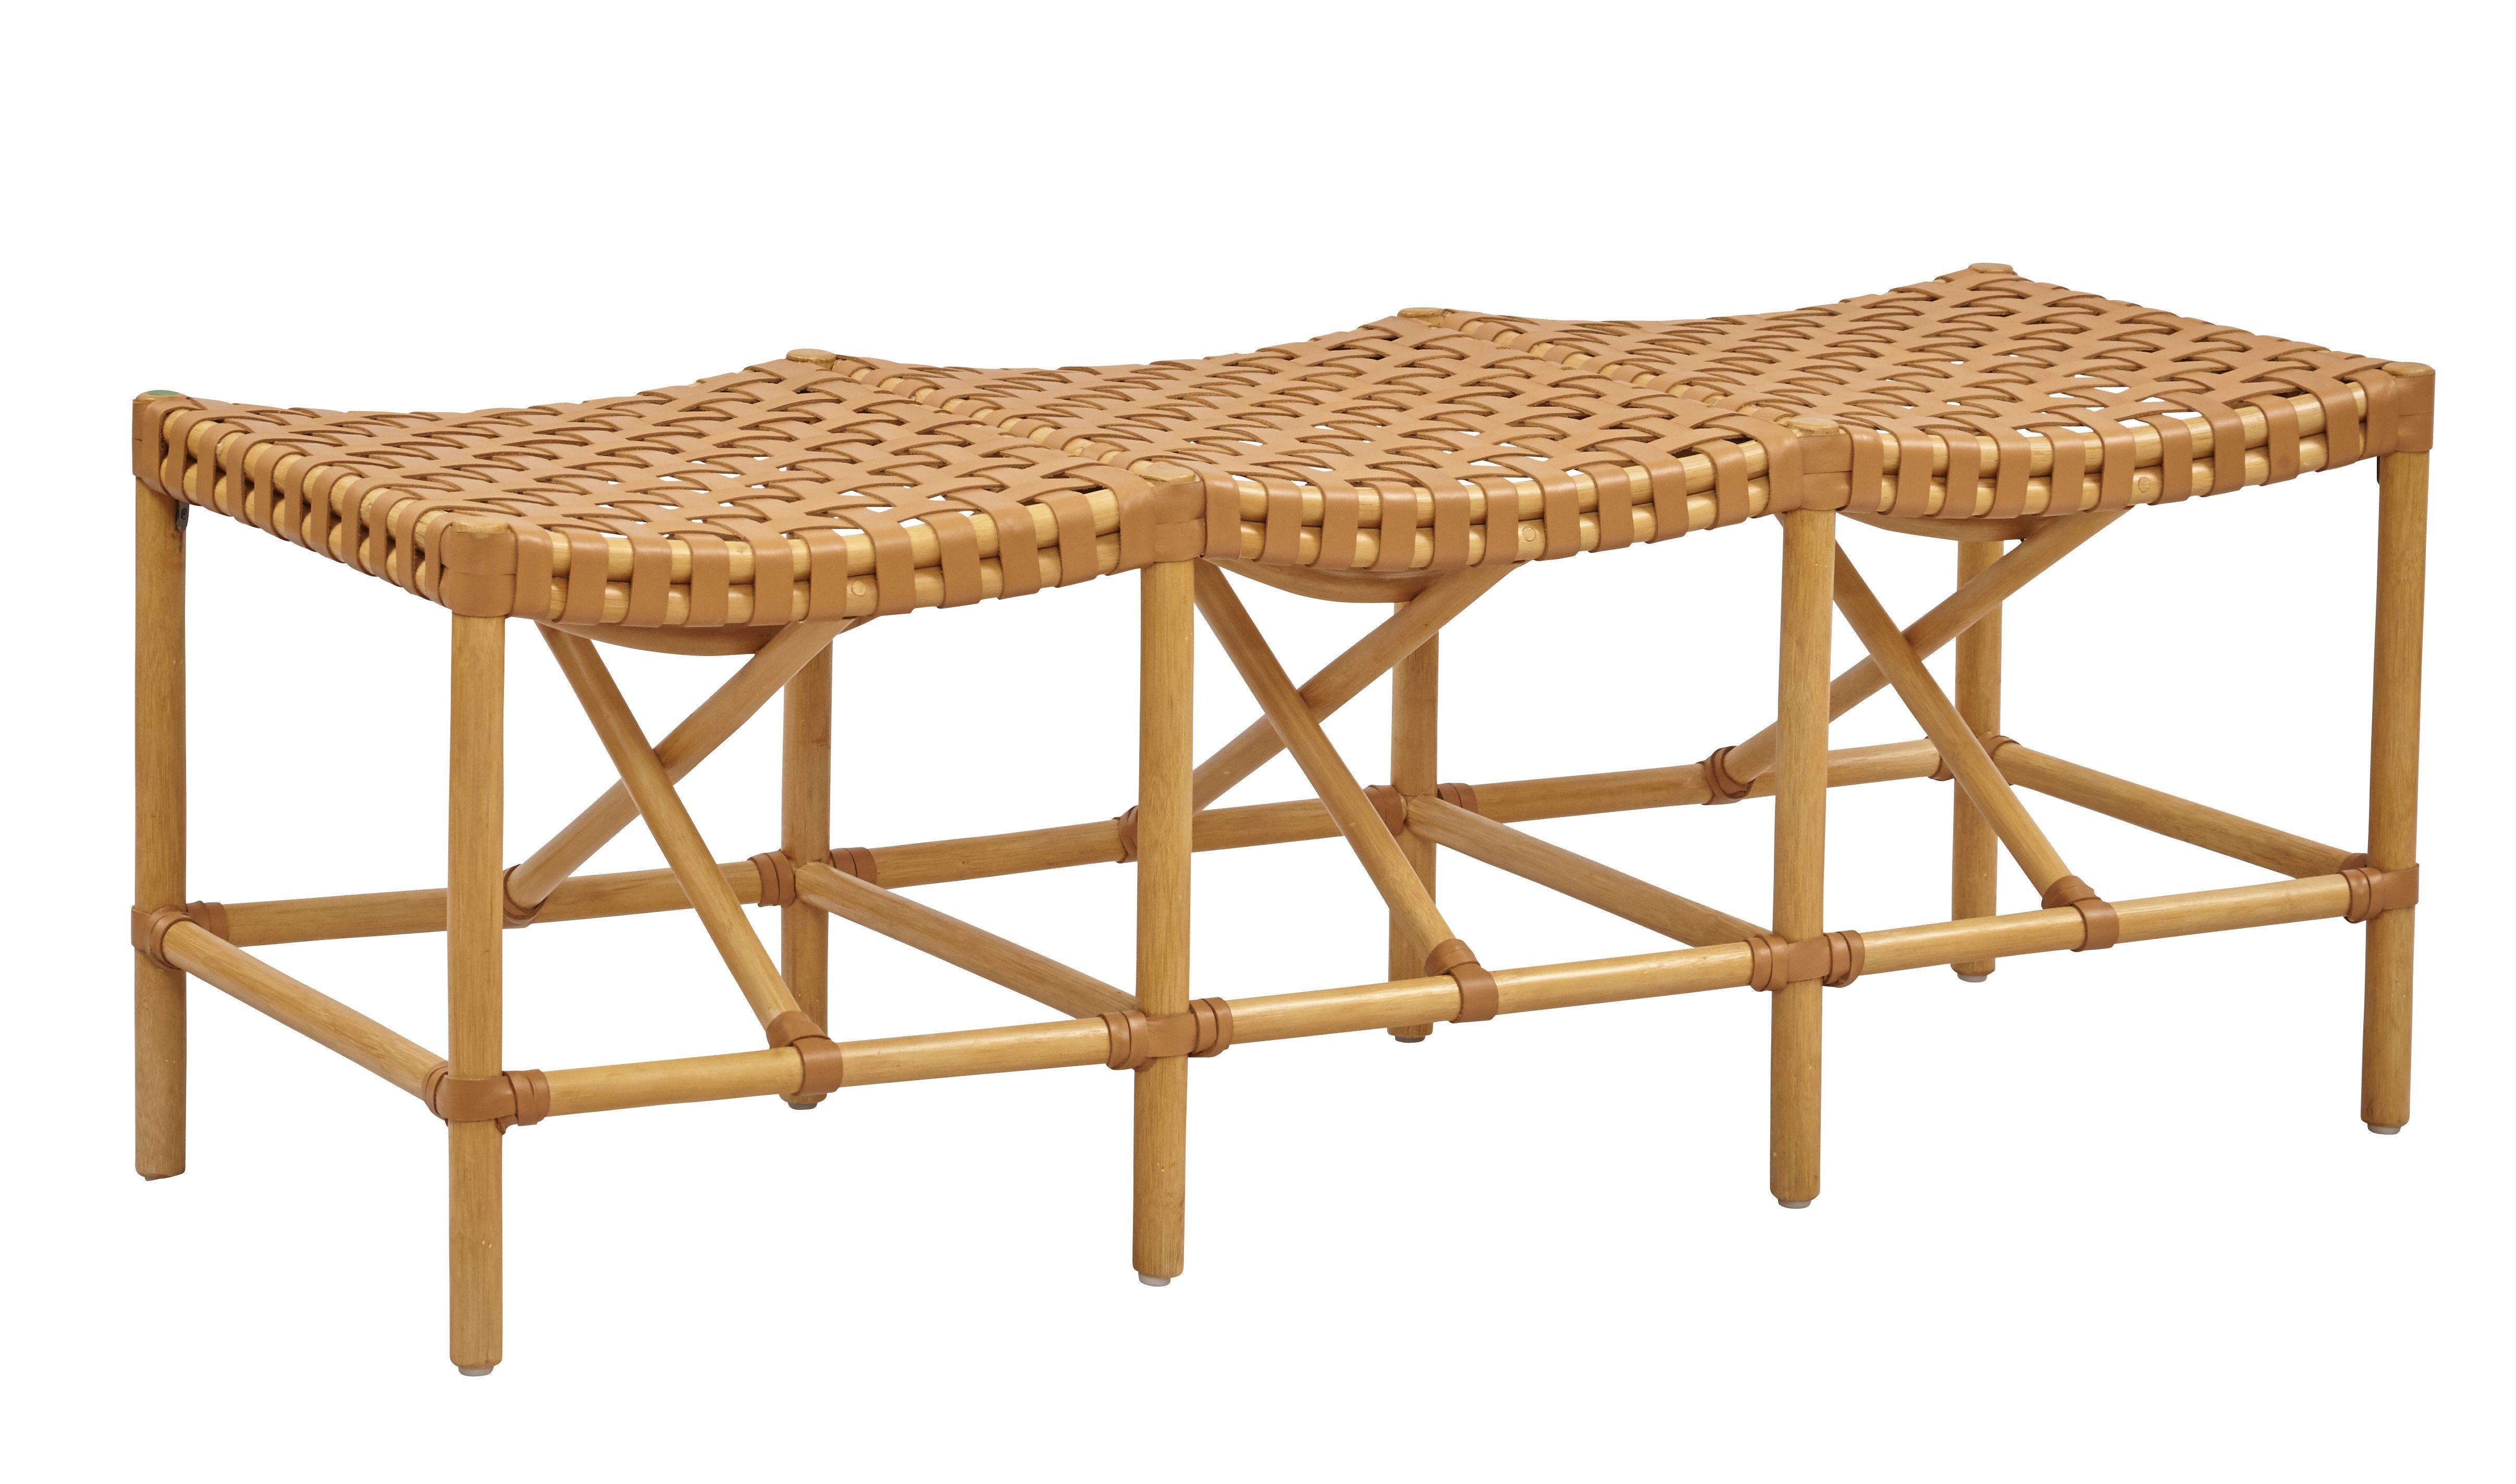 Malibu Bench. Natural rattan w/woven Saddle leather